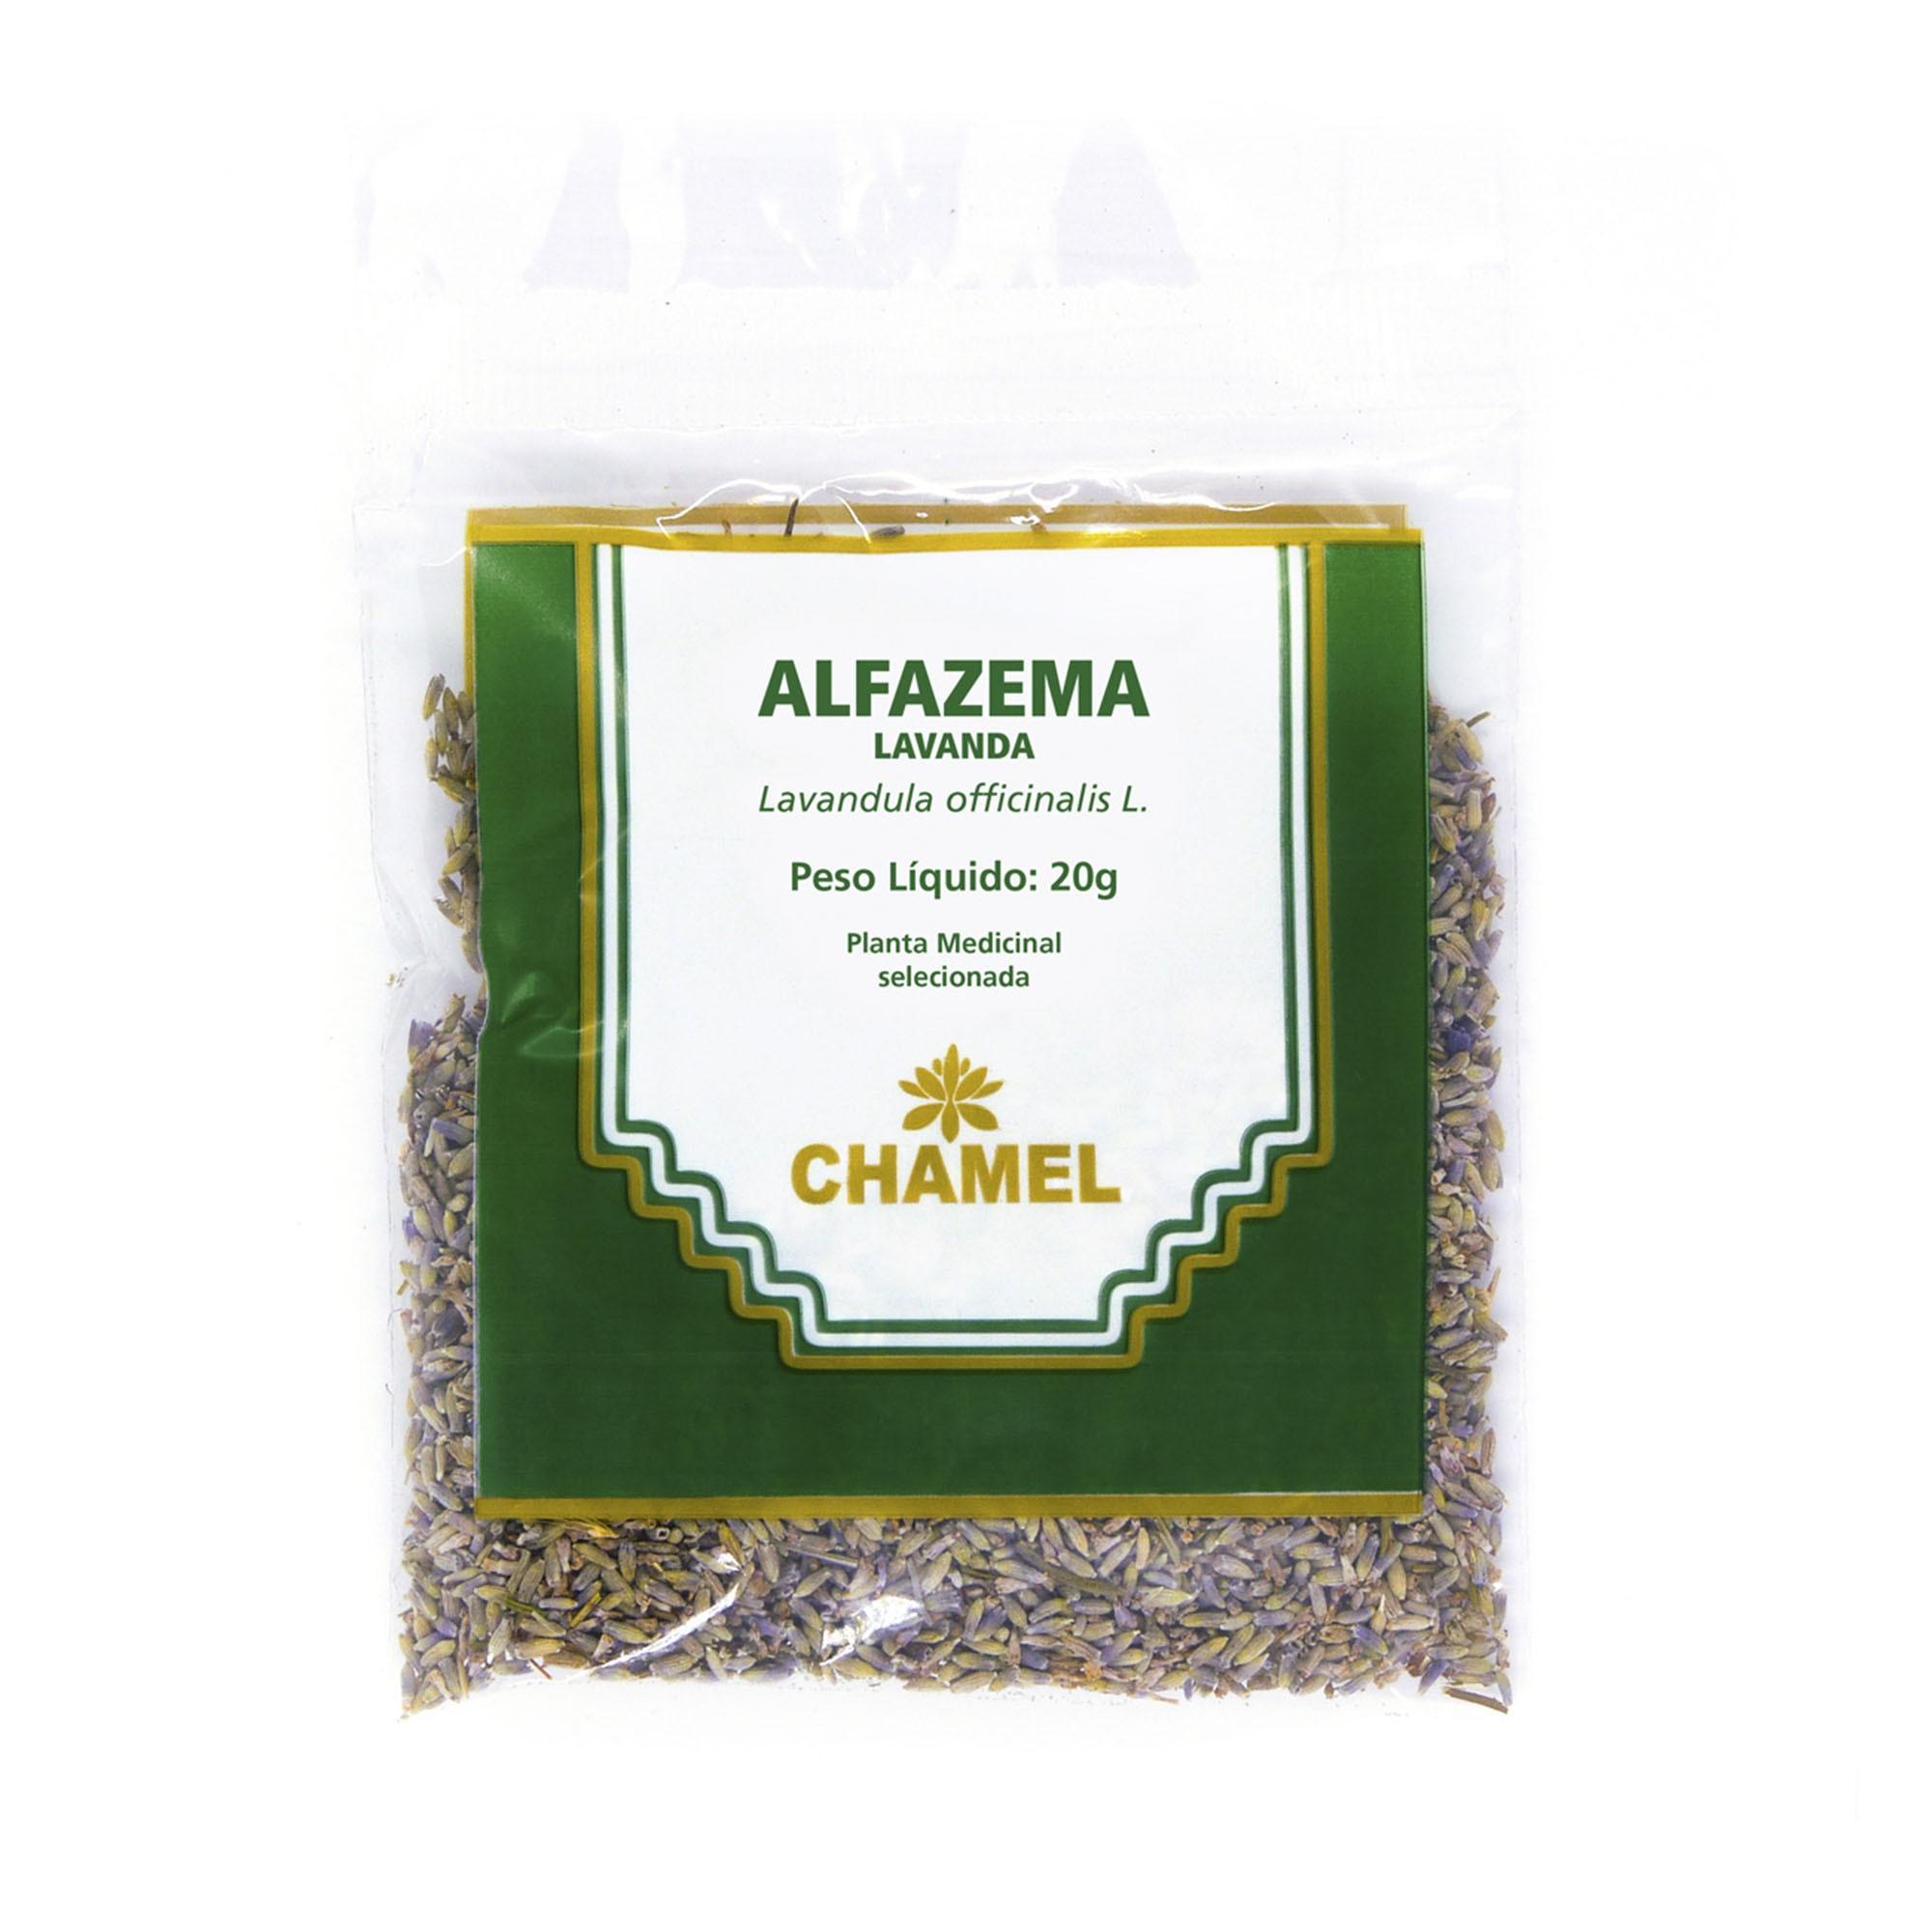 Alfazema 20g Chamel - Chá-Flores